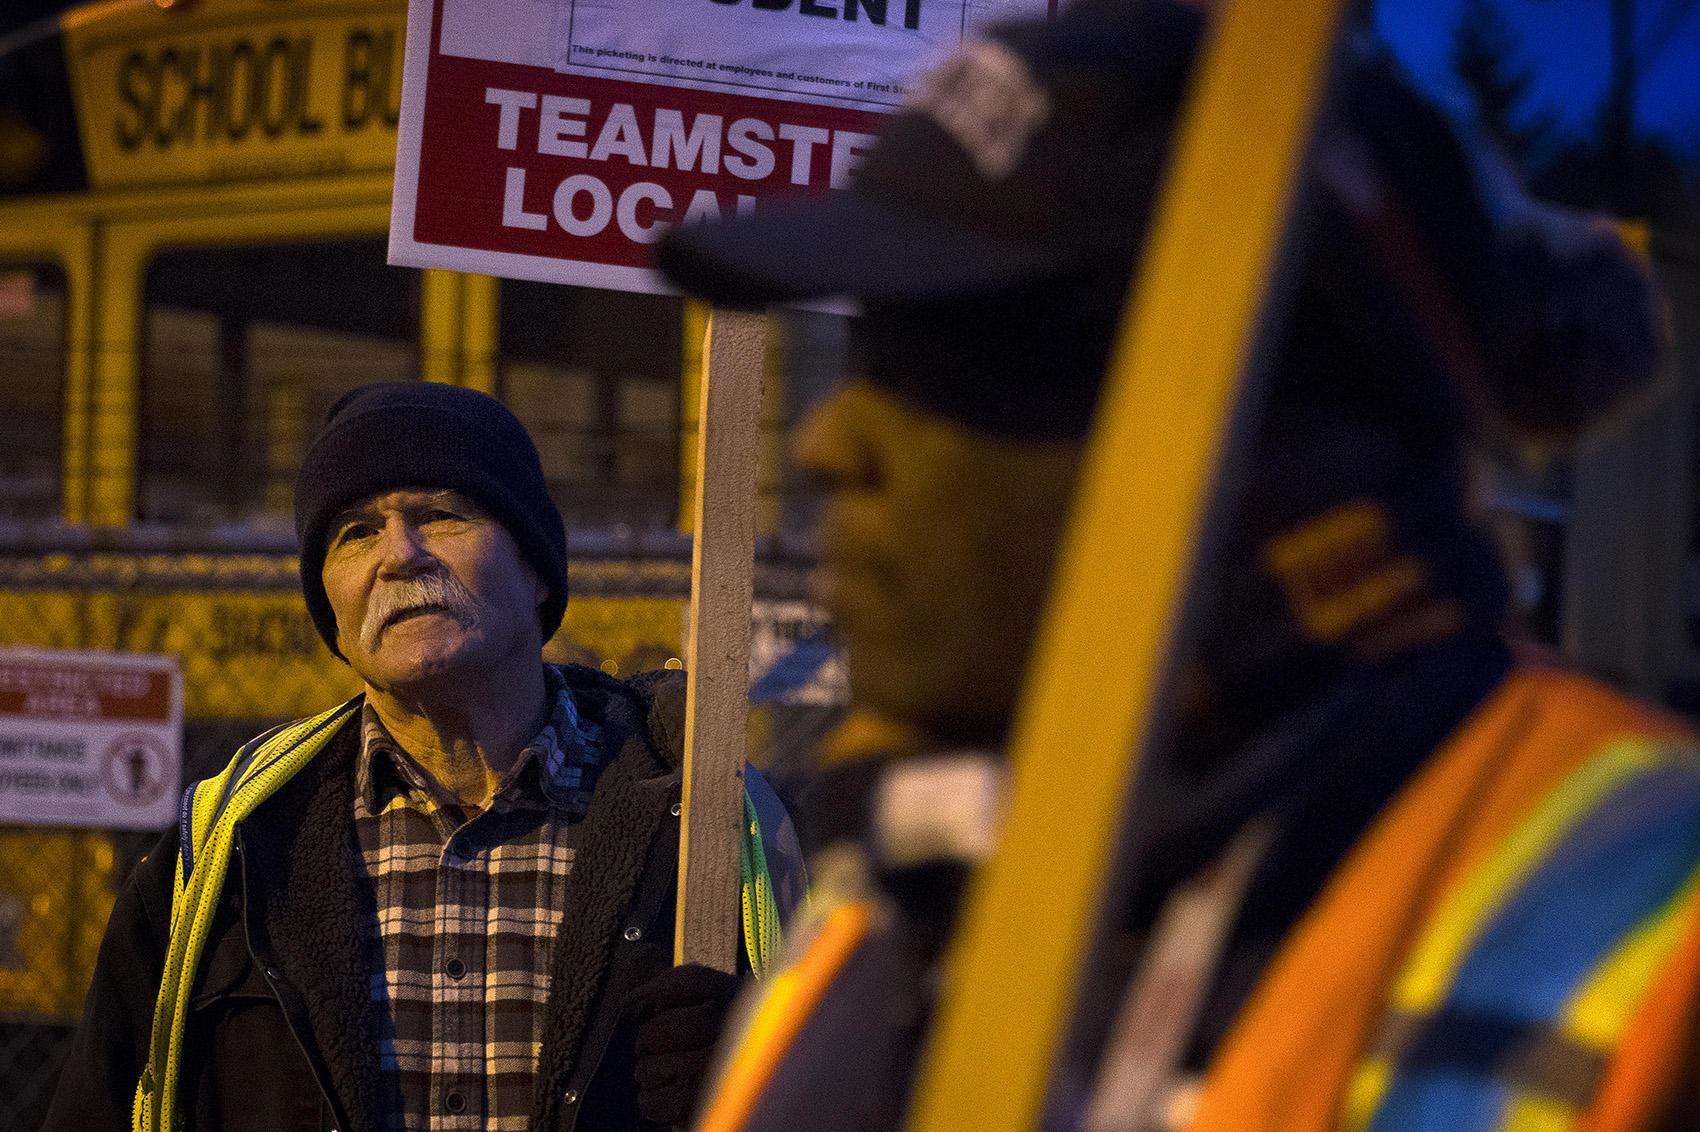 School bus drivers planning to strike tomorrow